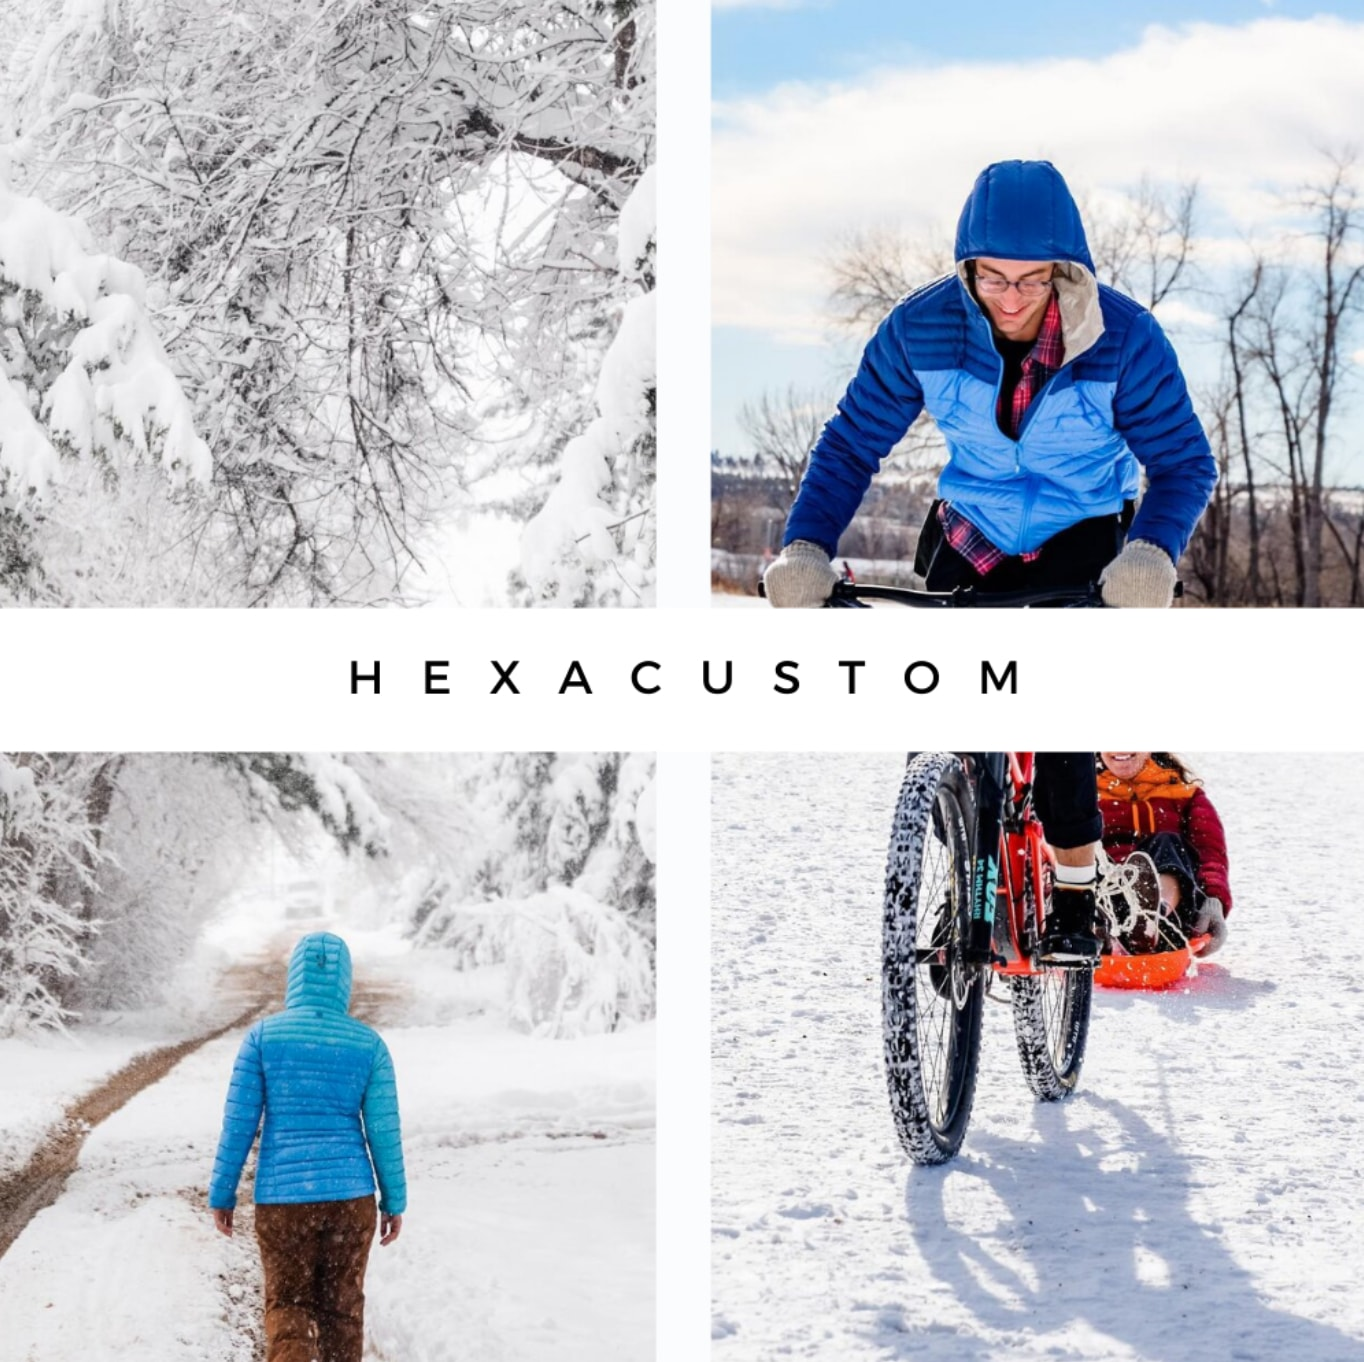 Hexa custom